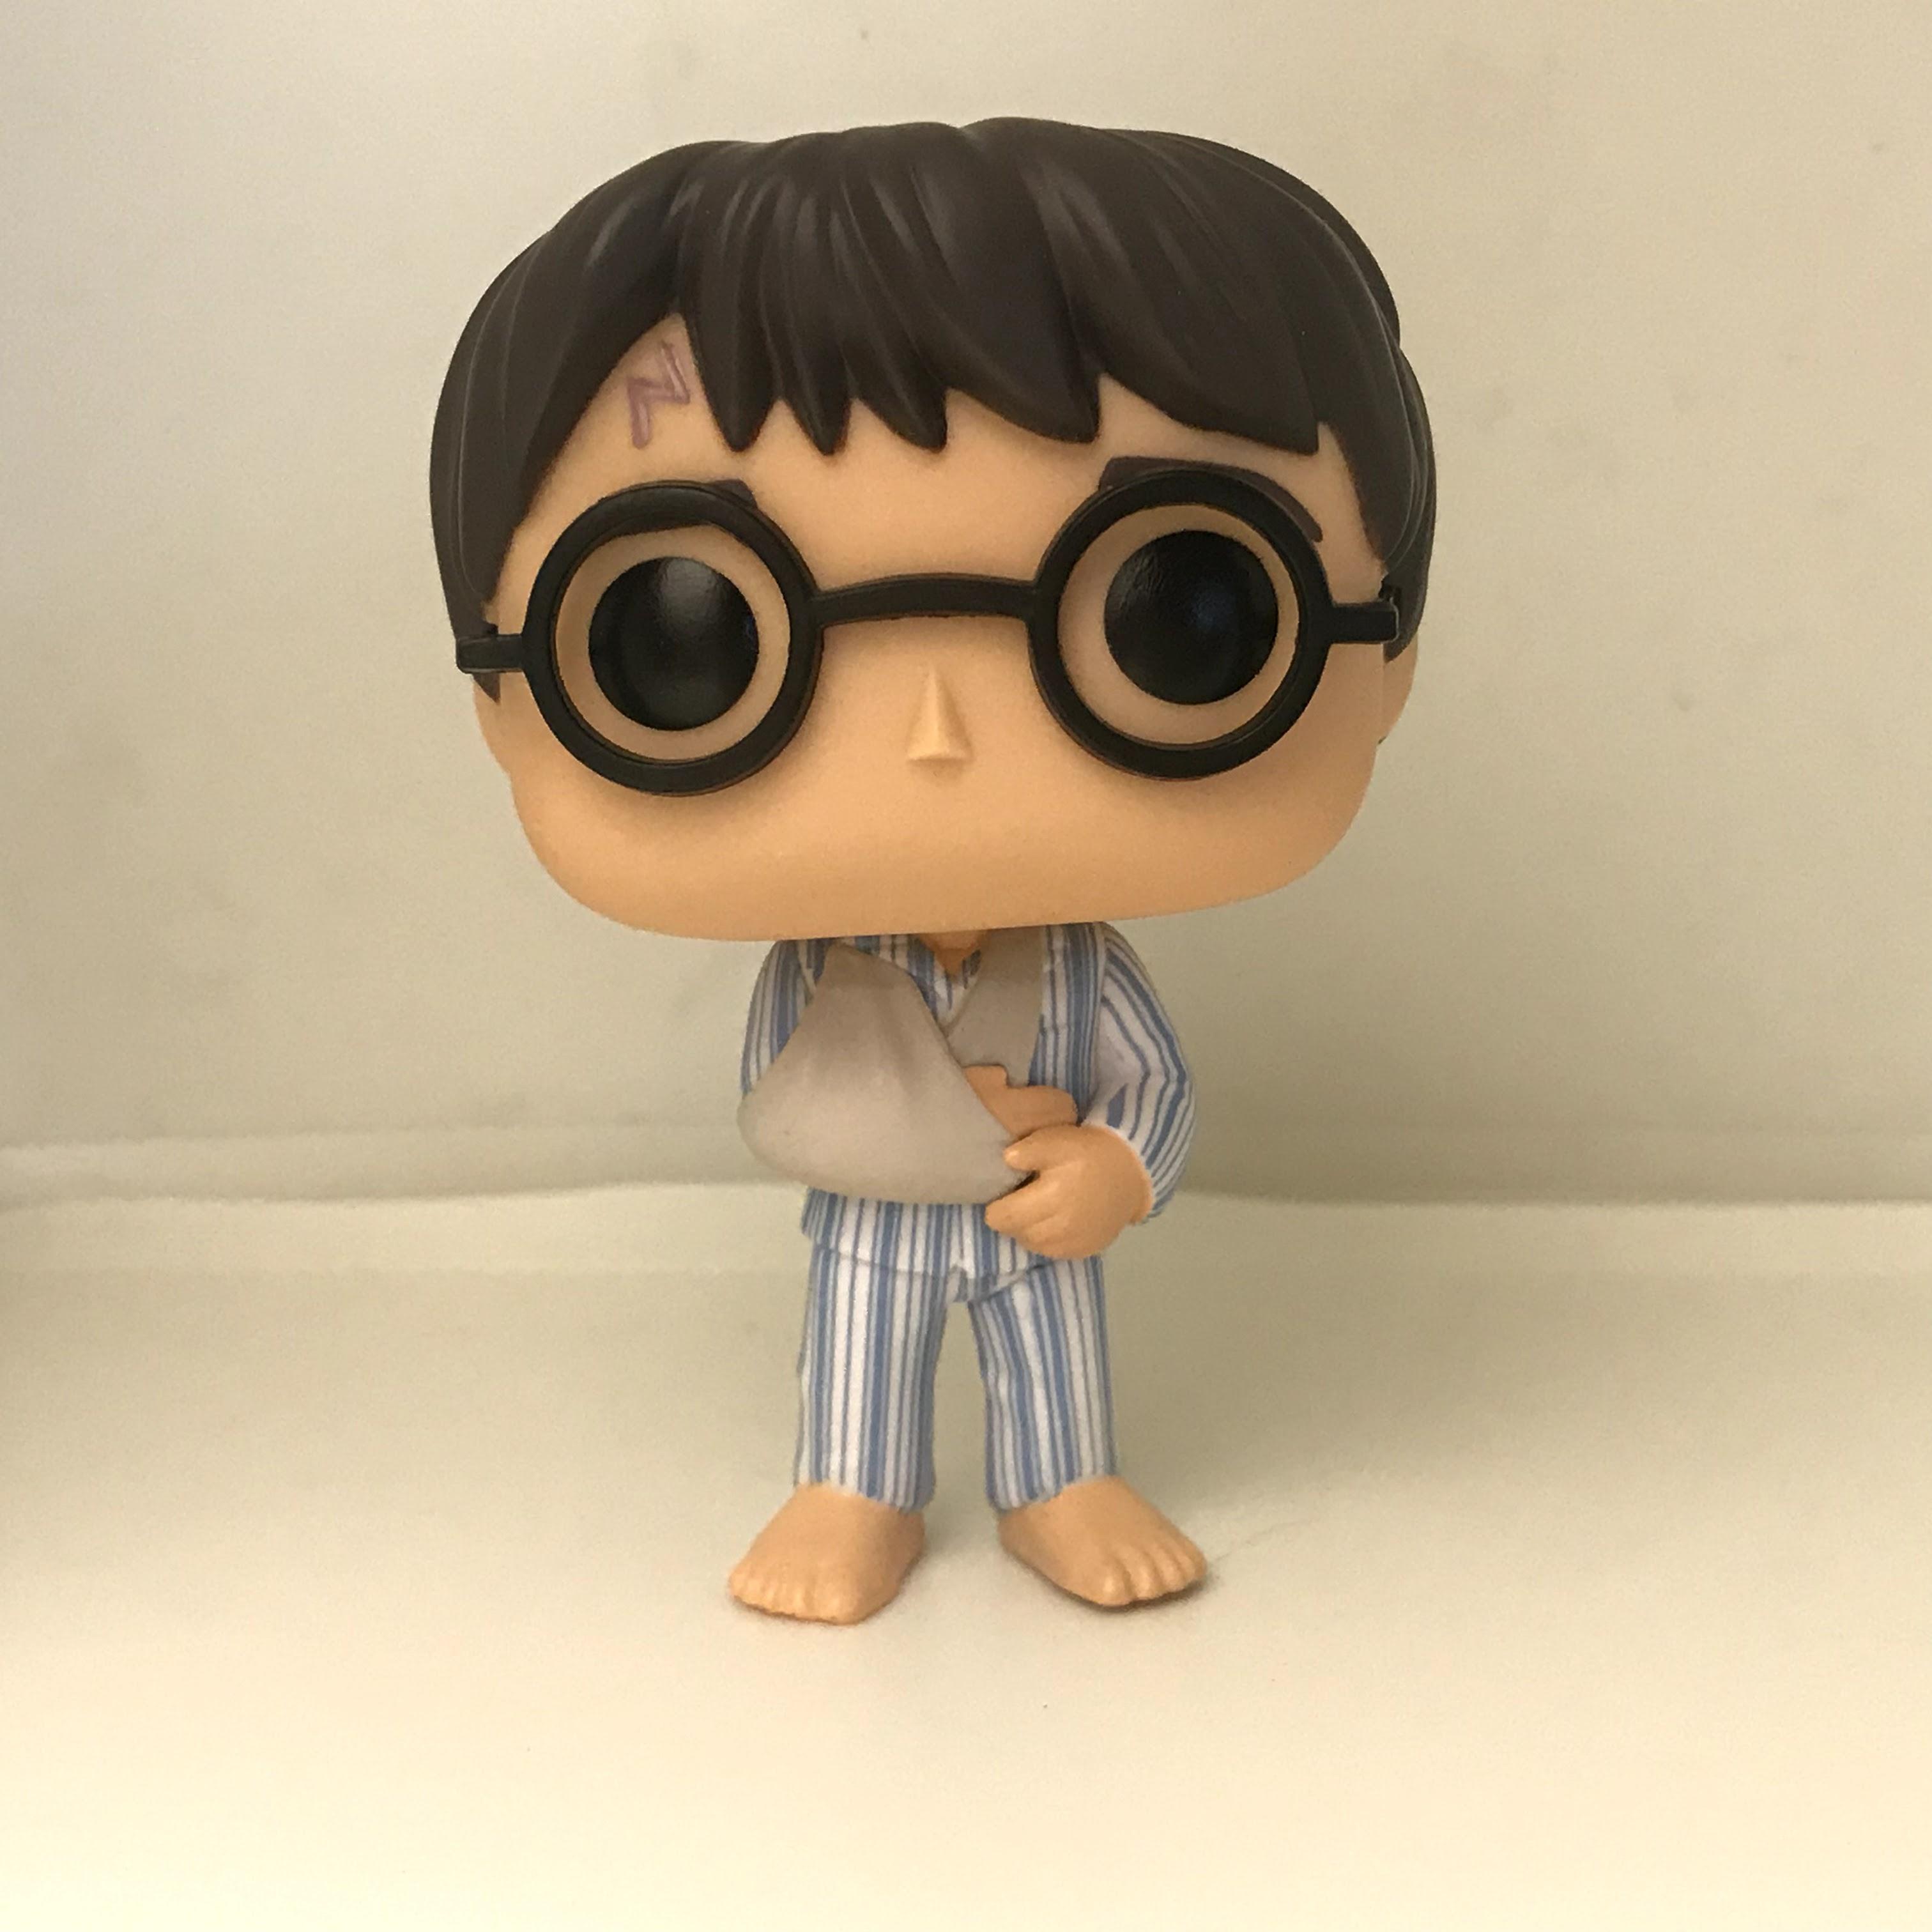 79 Harry Potter with Broken Arm